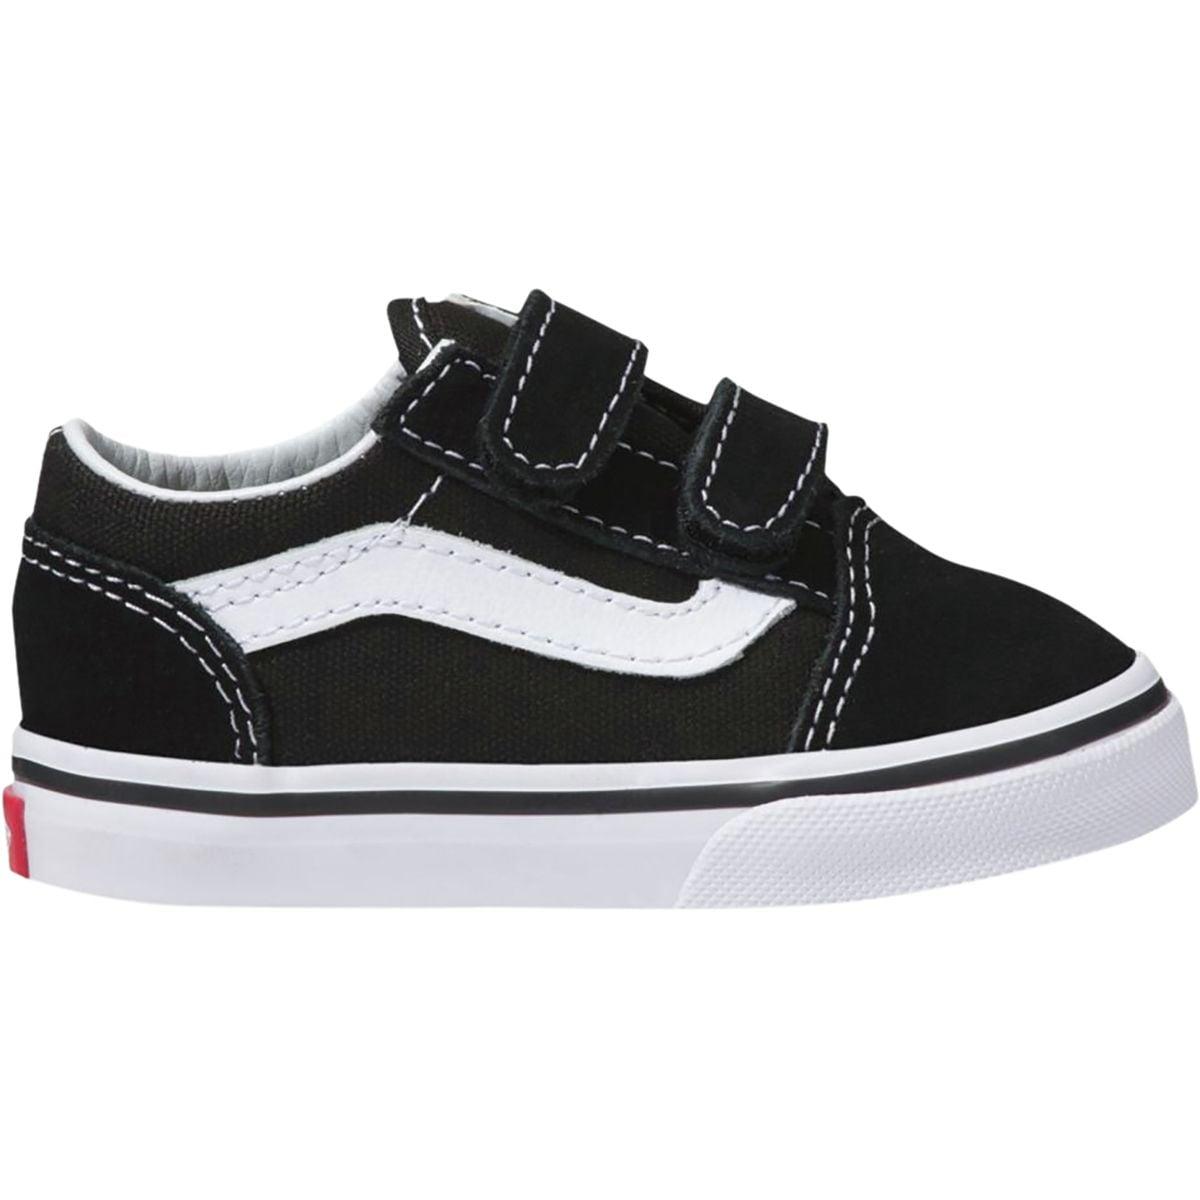 Vans Old Skool V Skate Shoe Toddler Boys'  